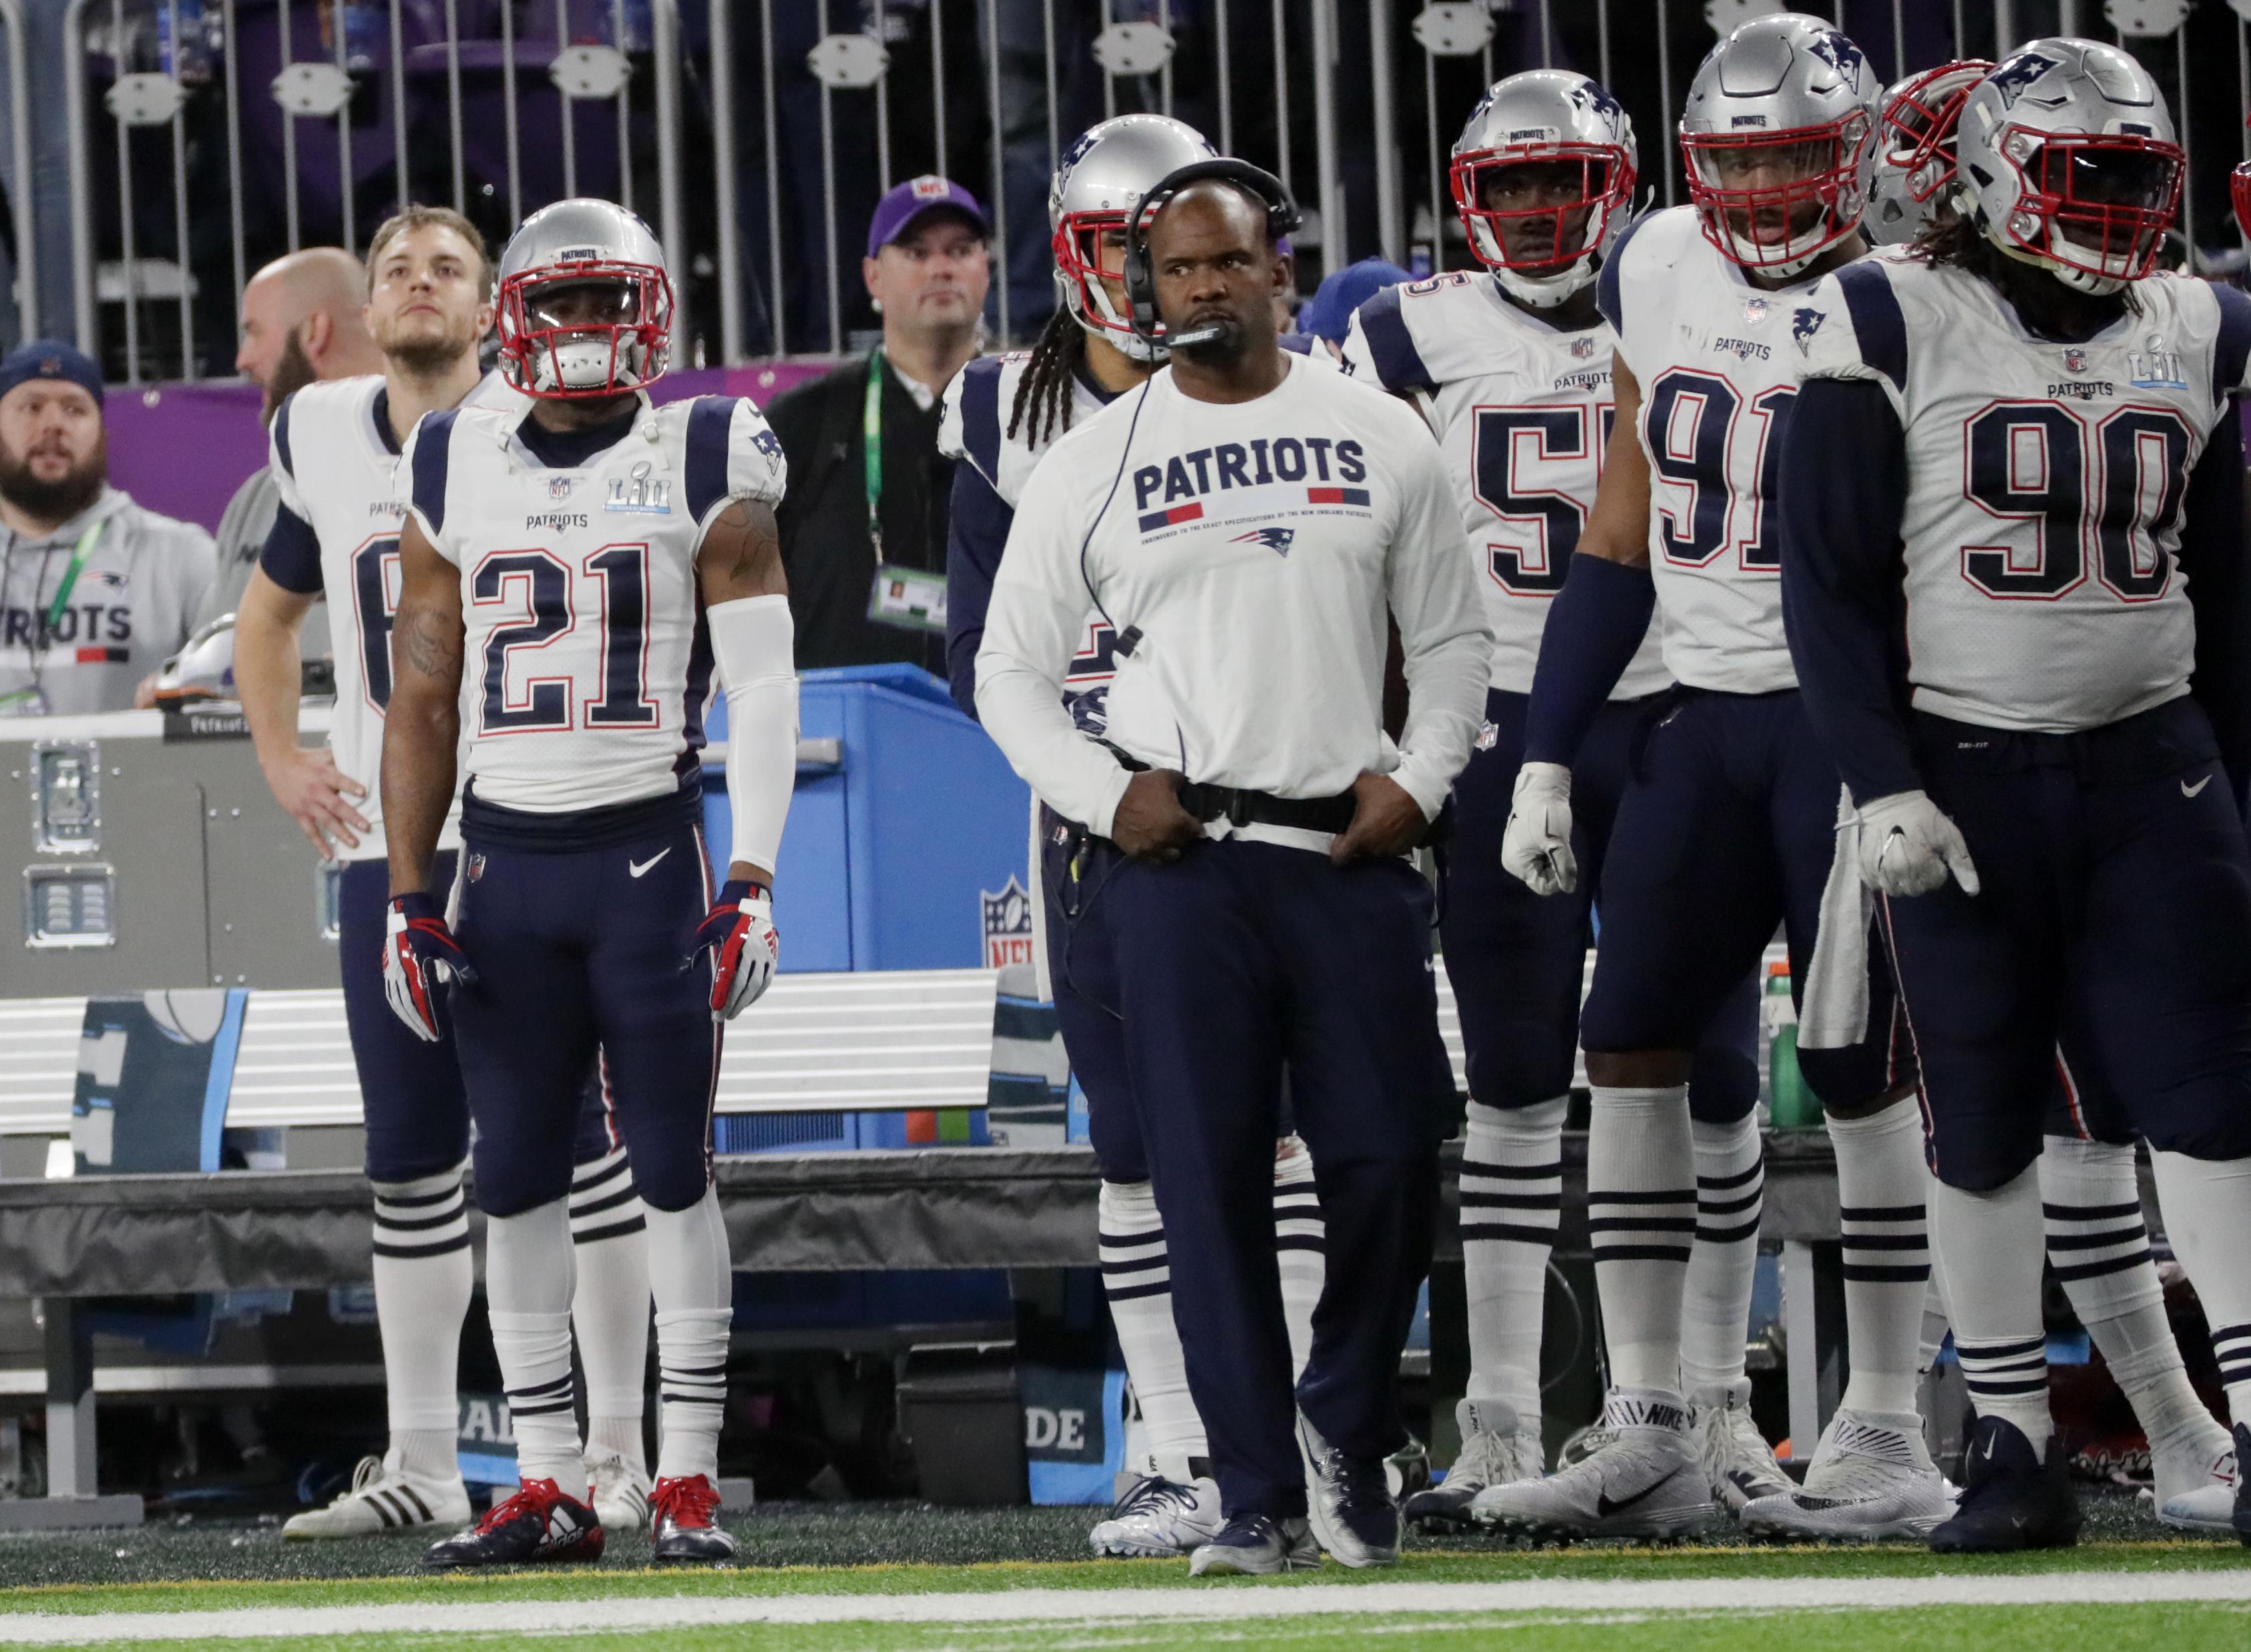 Super Bowl LII: Philadelphia Eagles Vs New England Patriots At US Bank Stadium